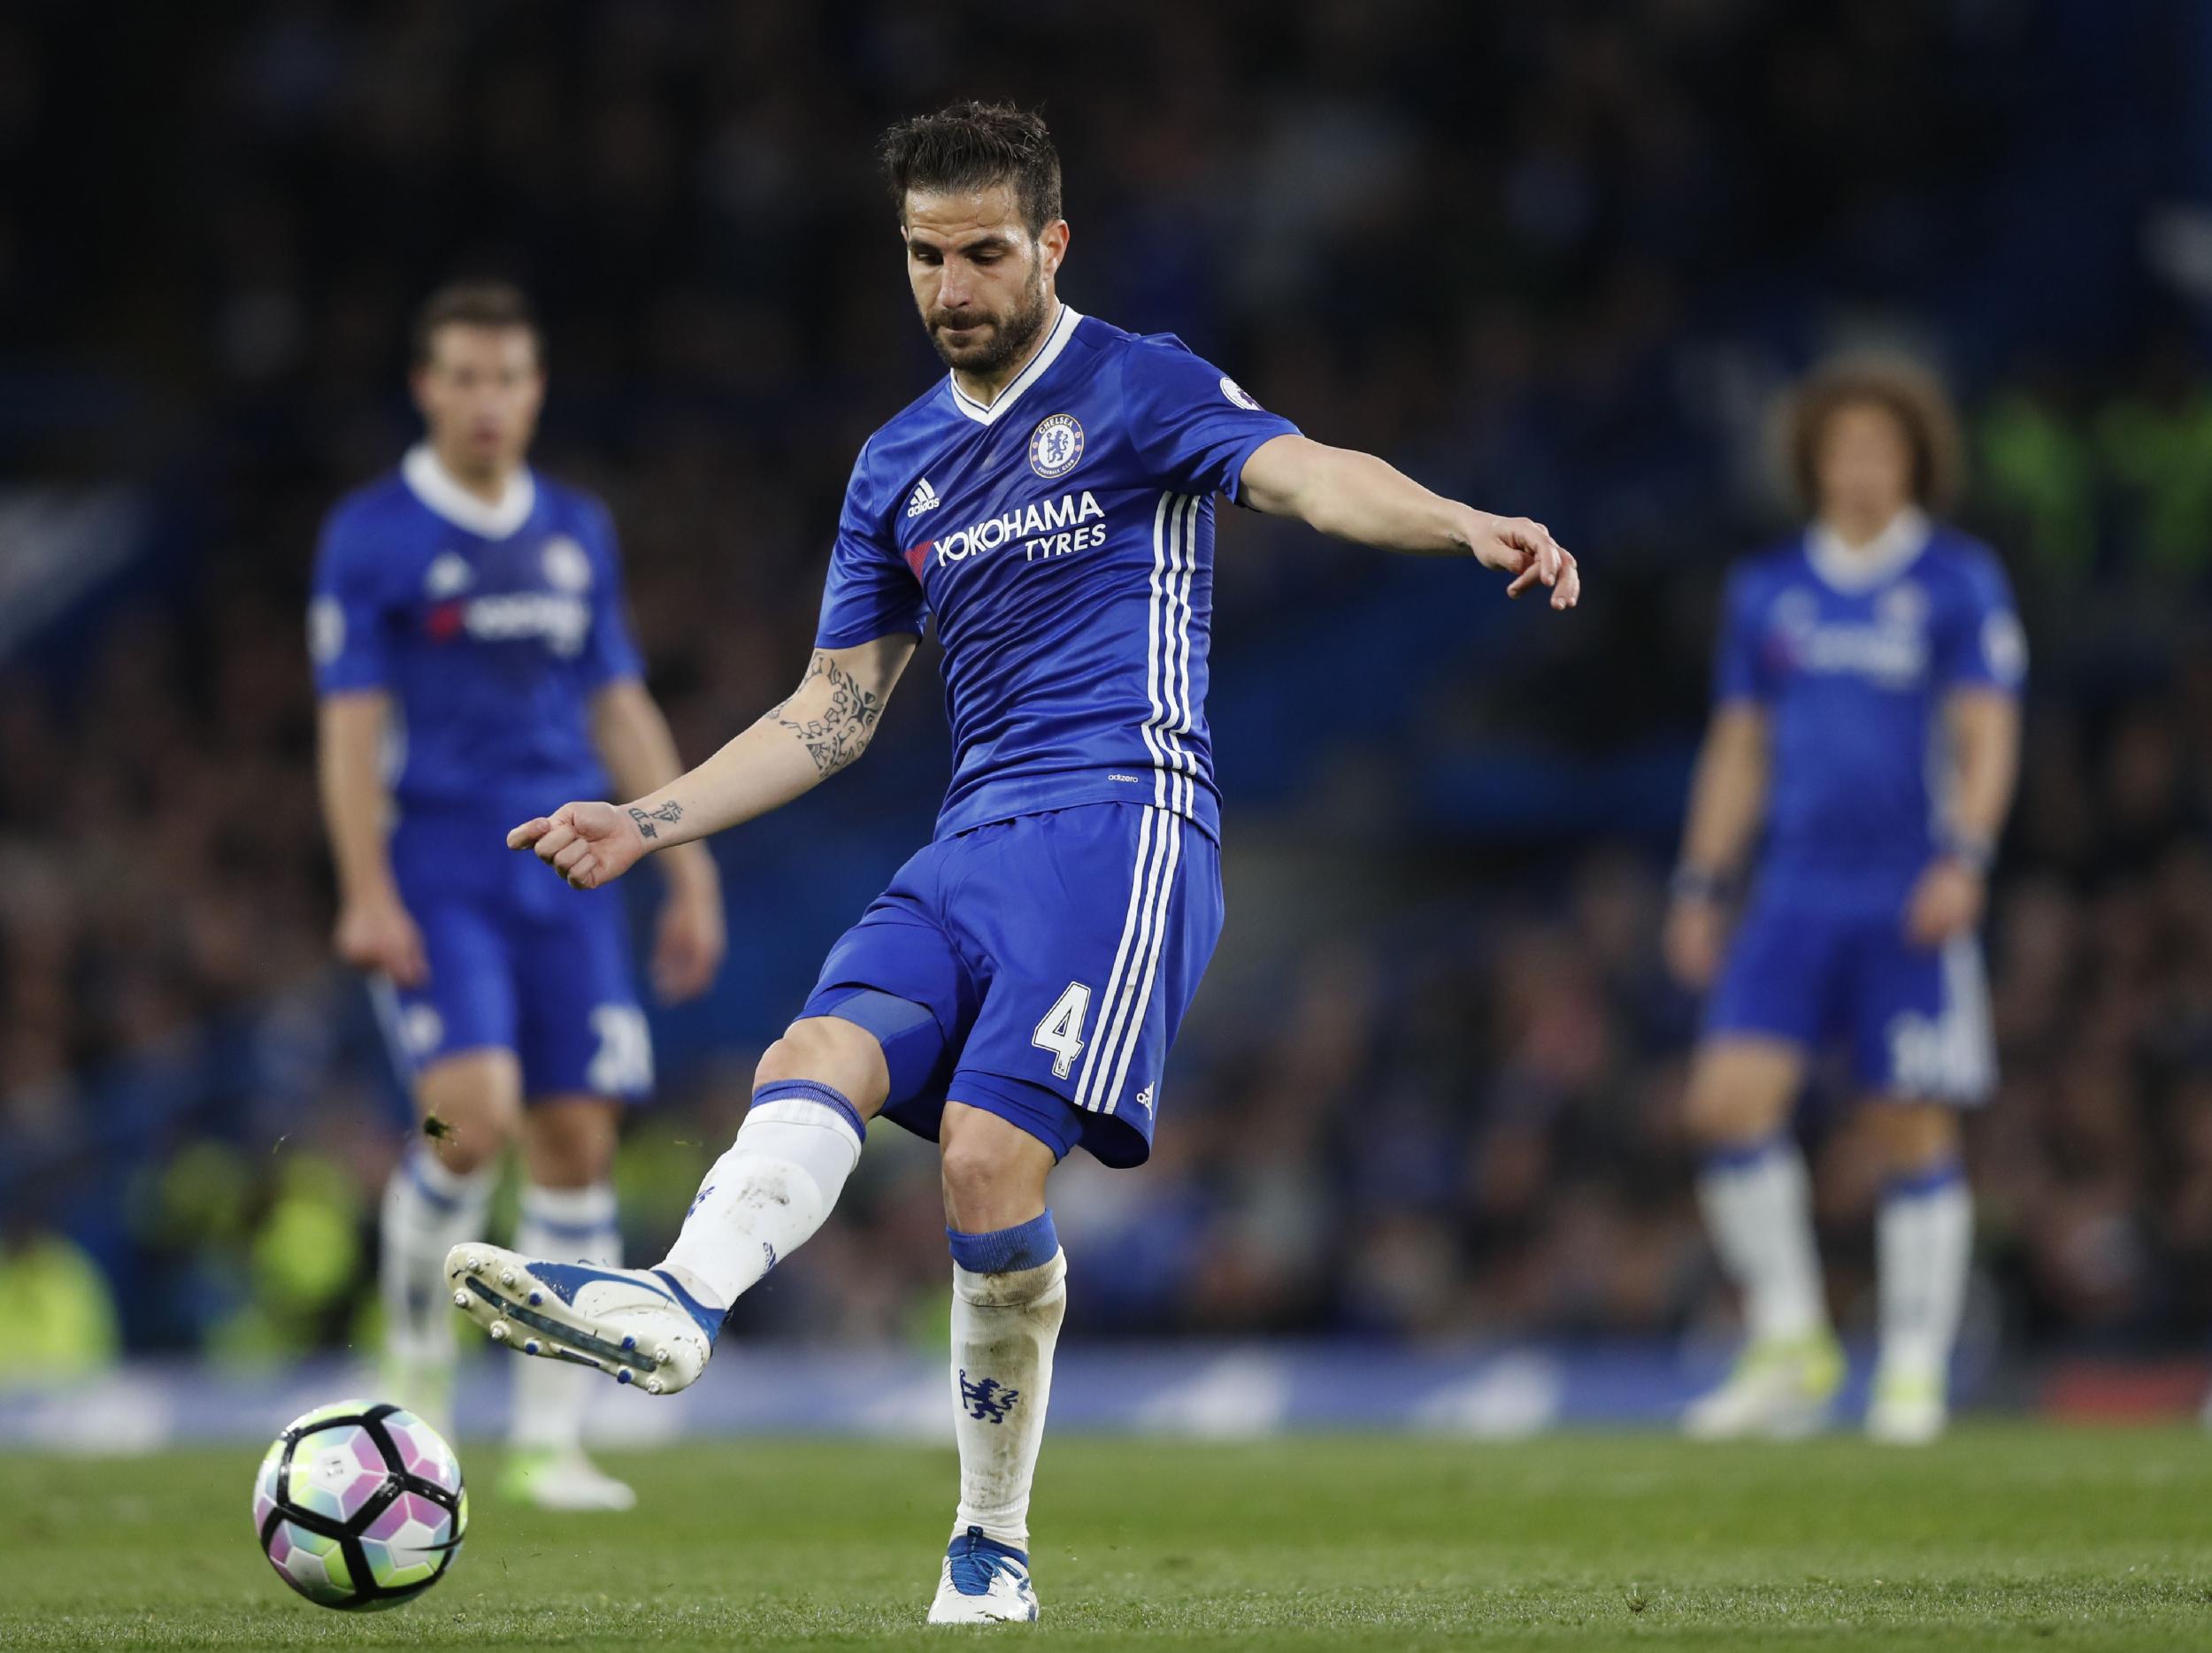 Cesc Fabregas hails his finest season of his Chelsea career